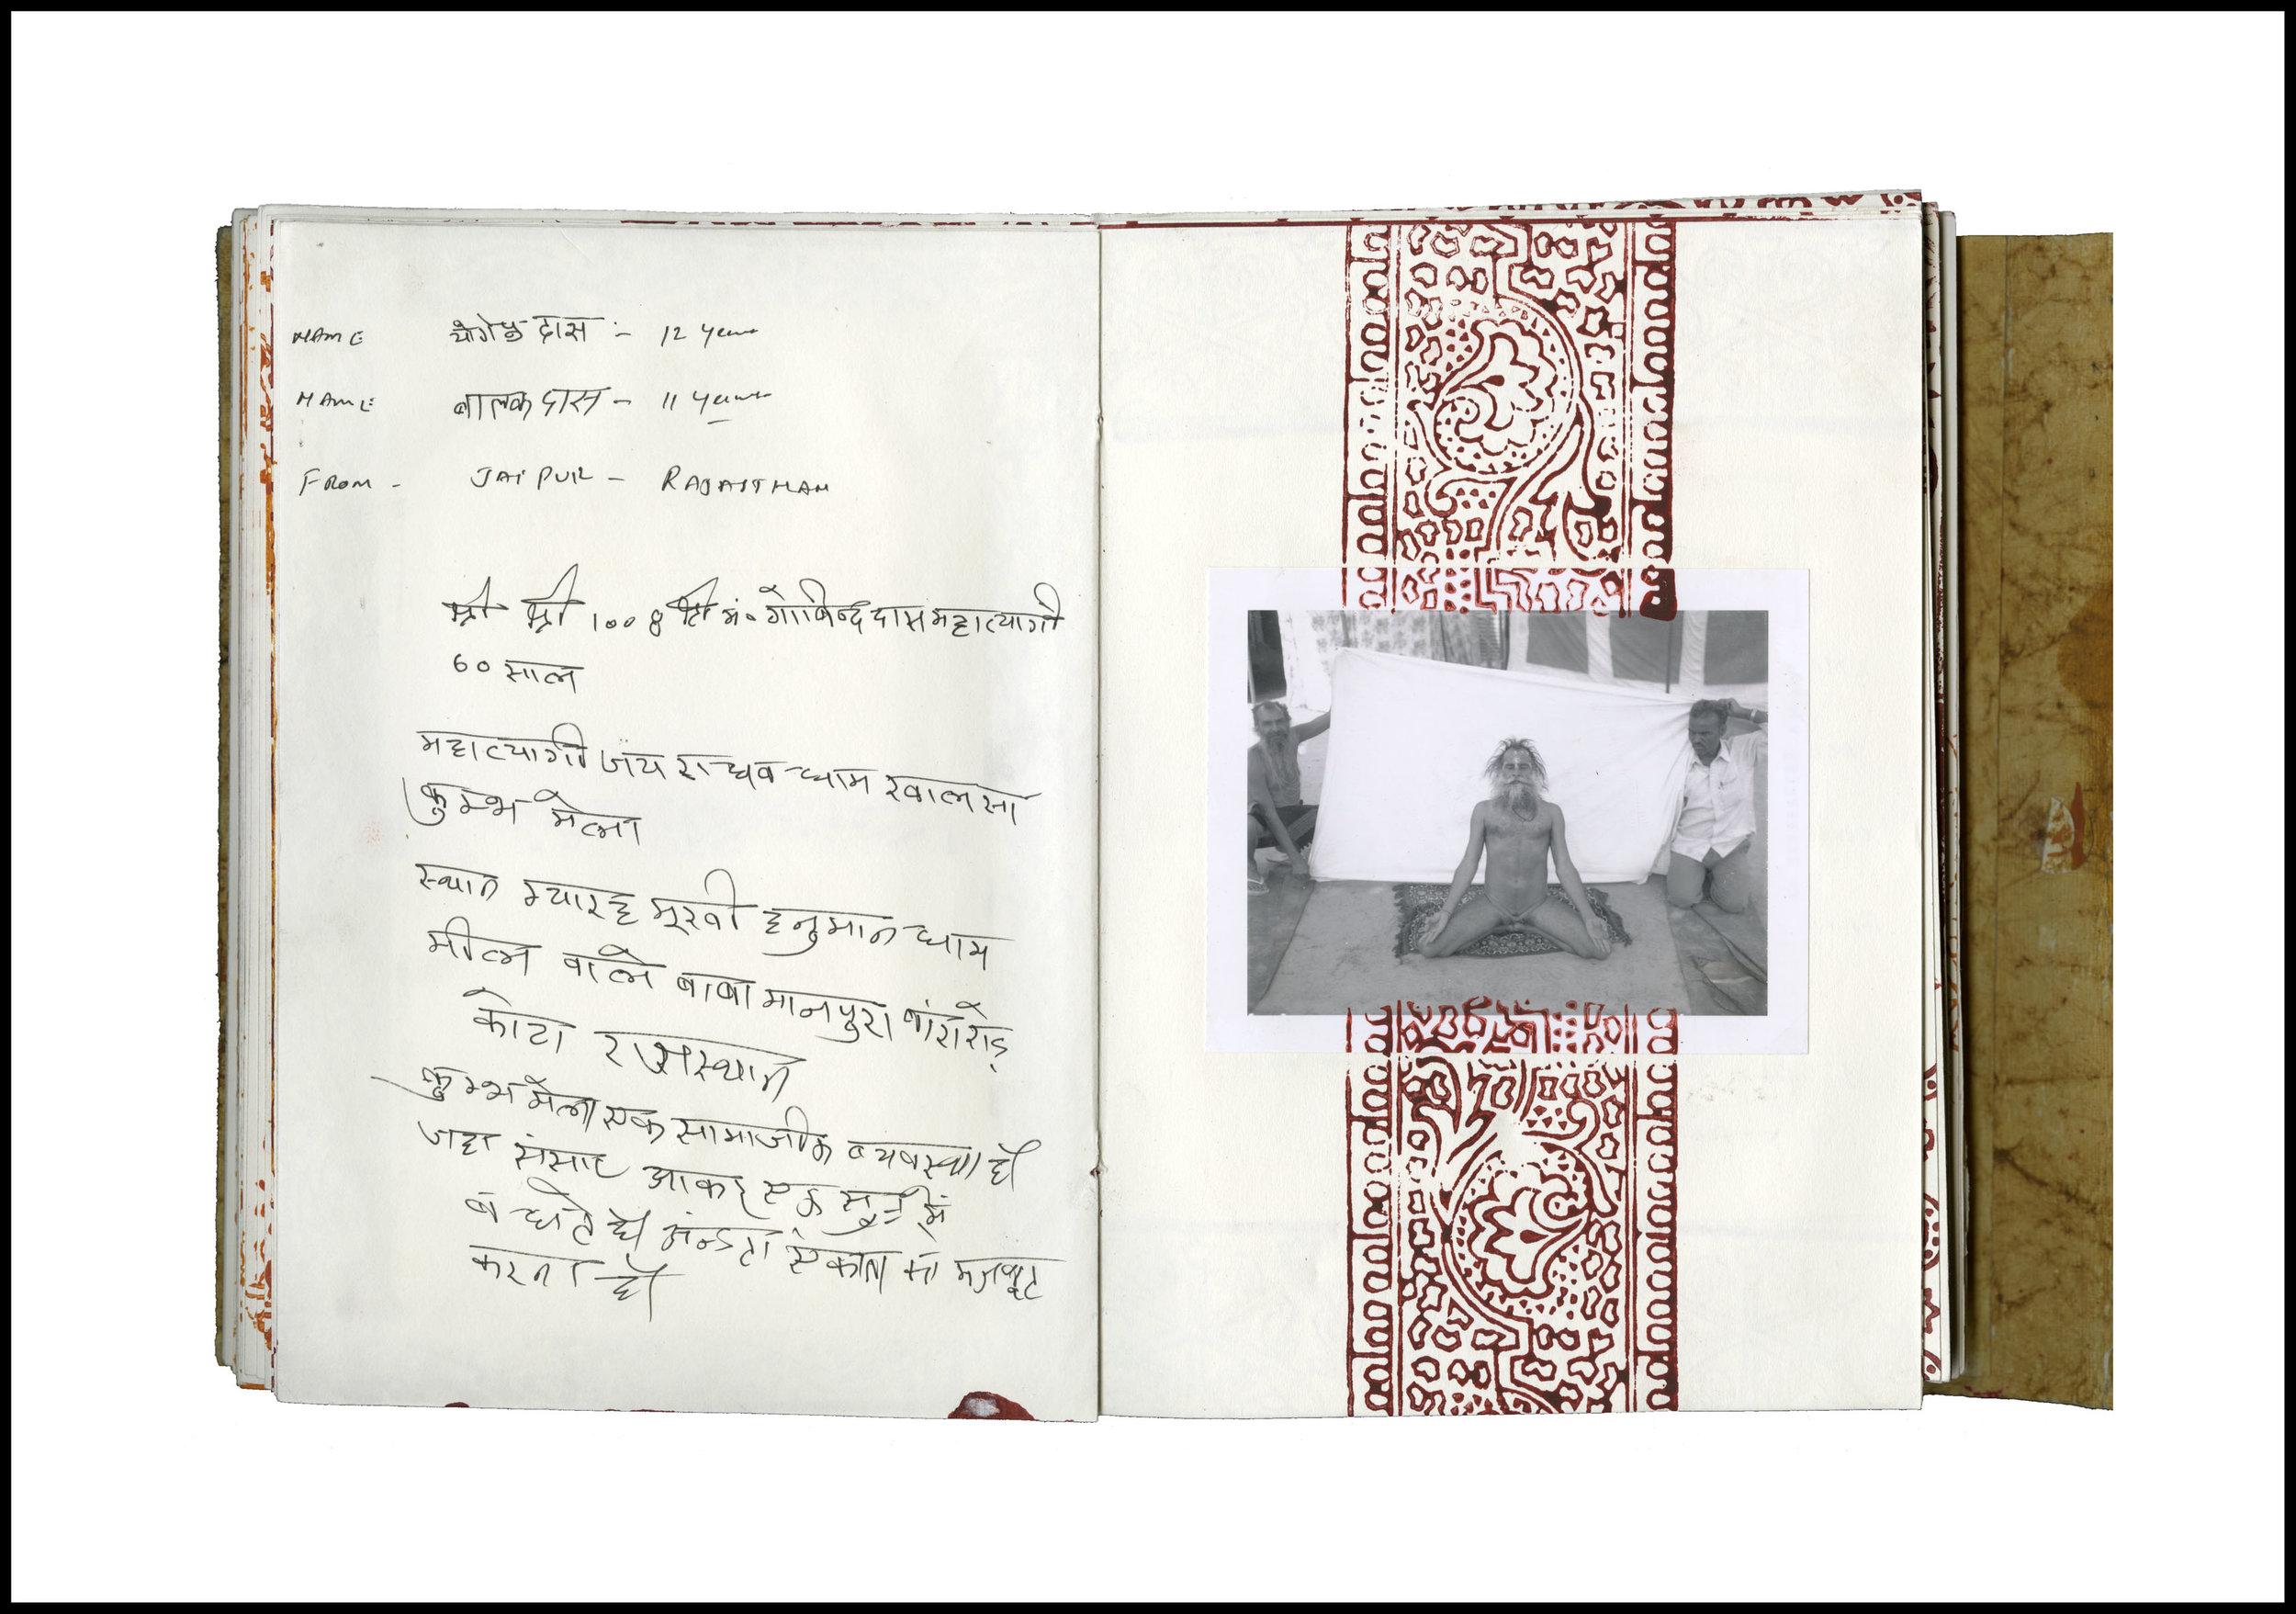 Kumbh Mela Diary 2010